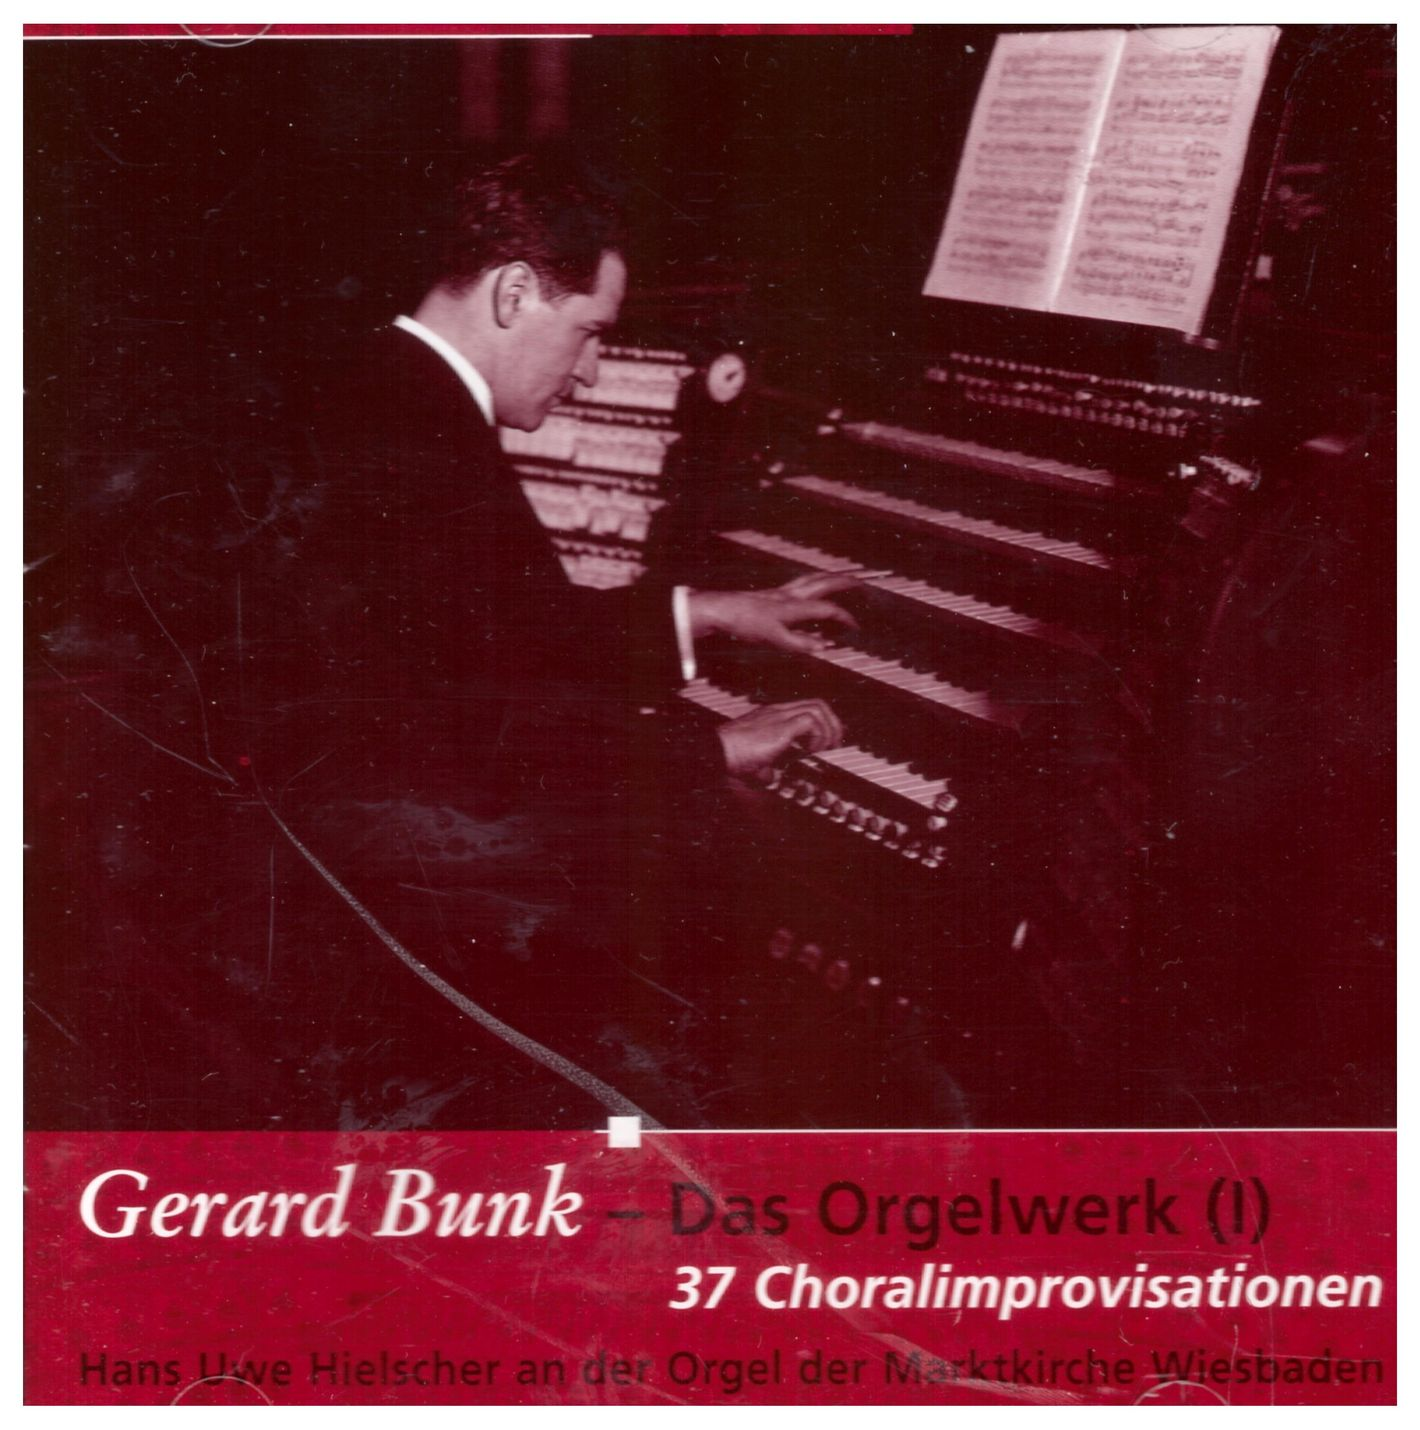 Gerard Bunk Organ Works II